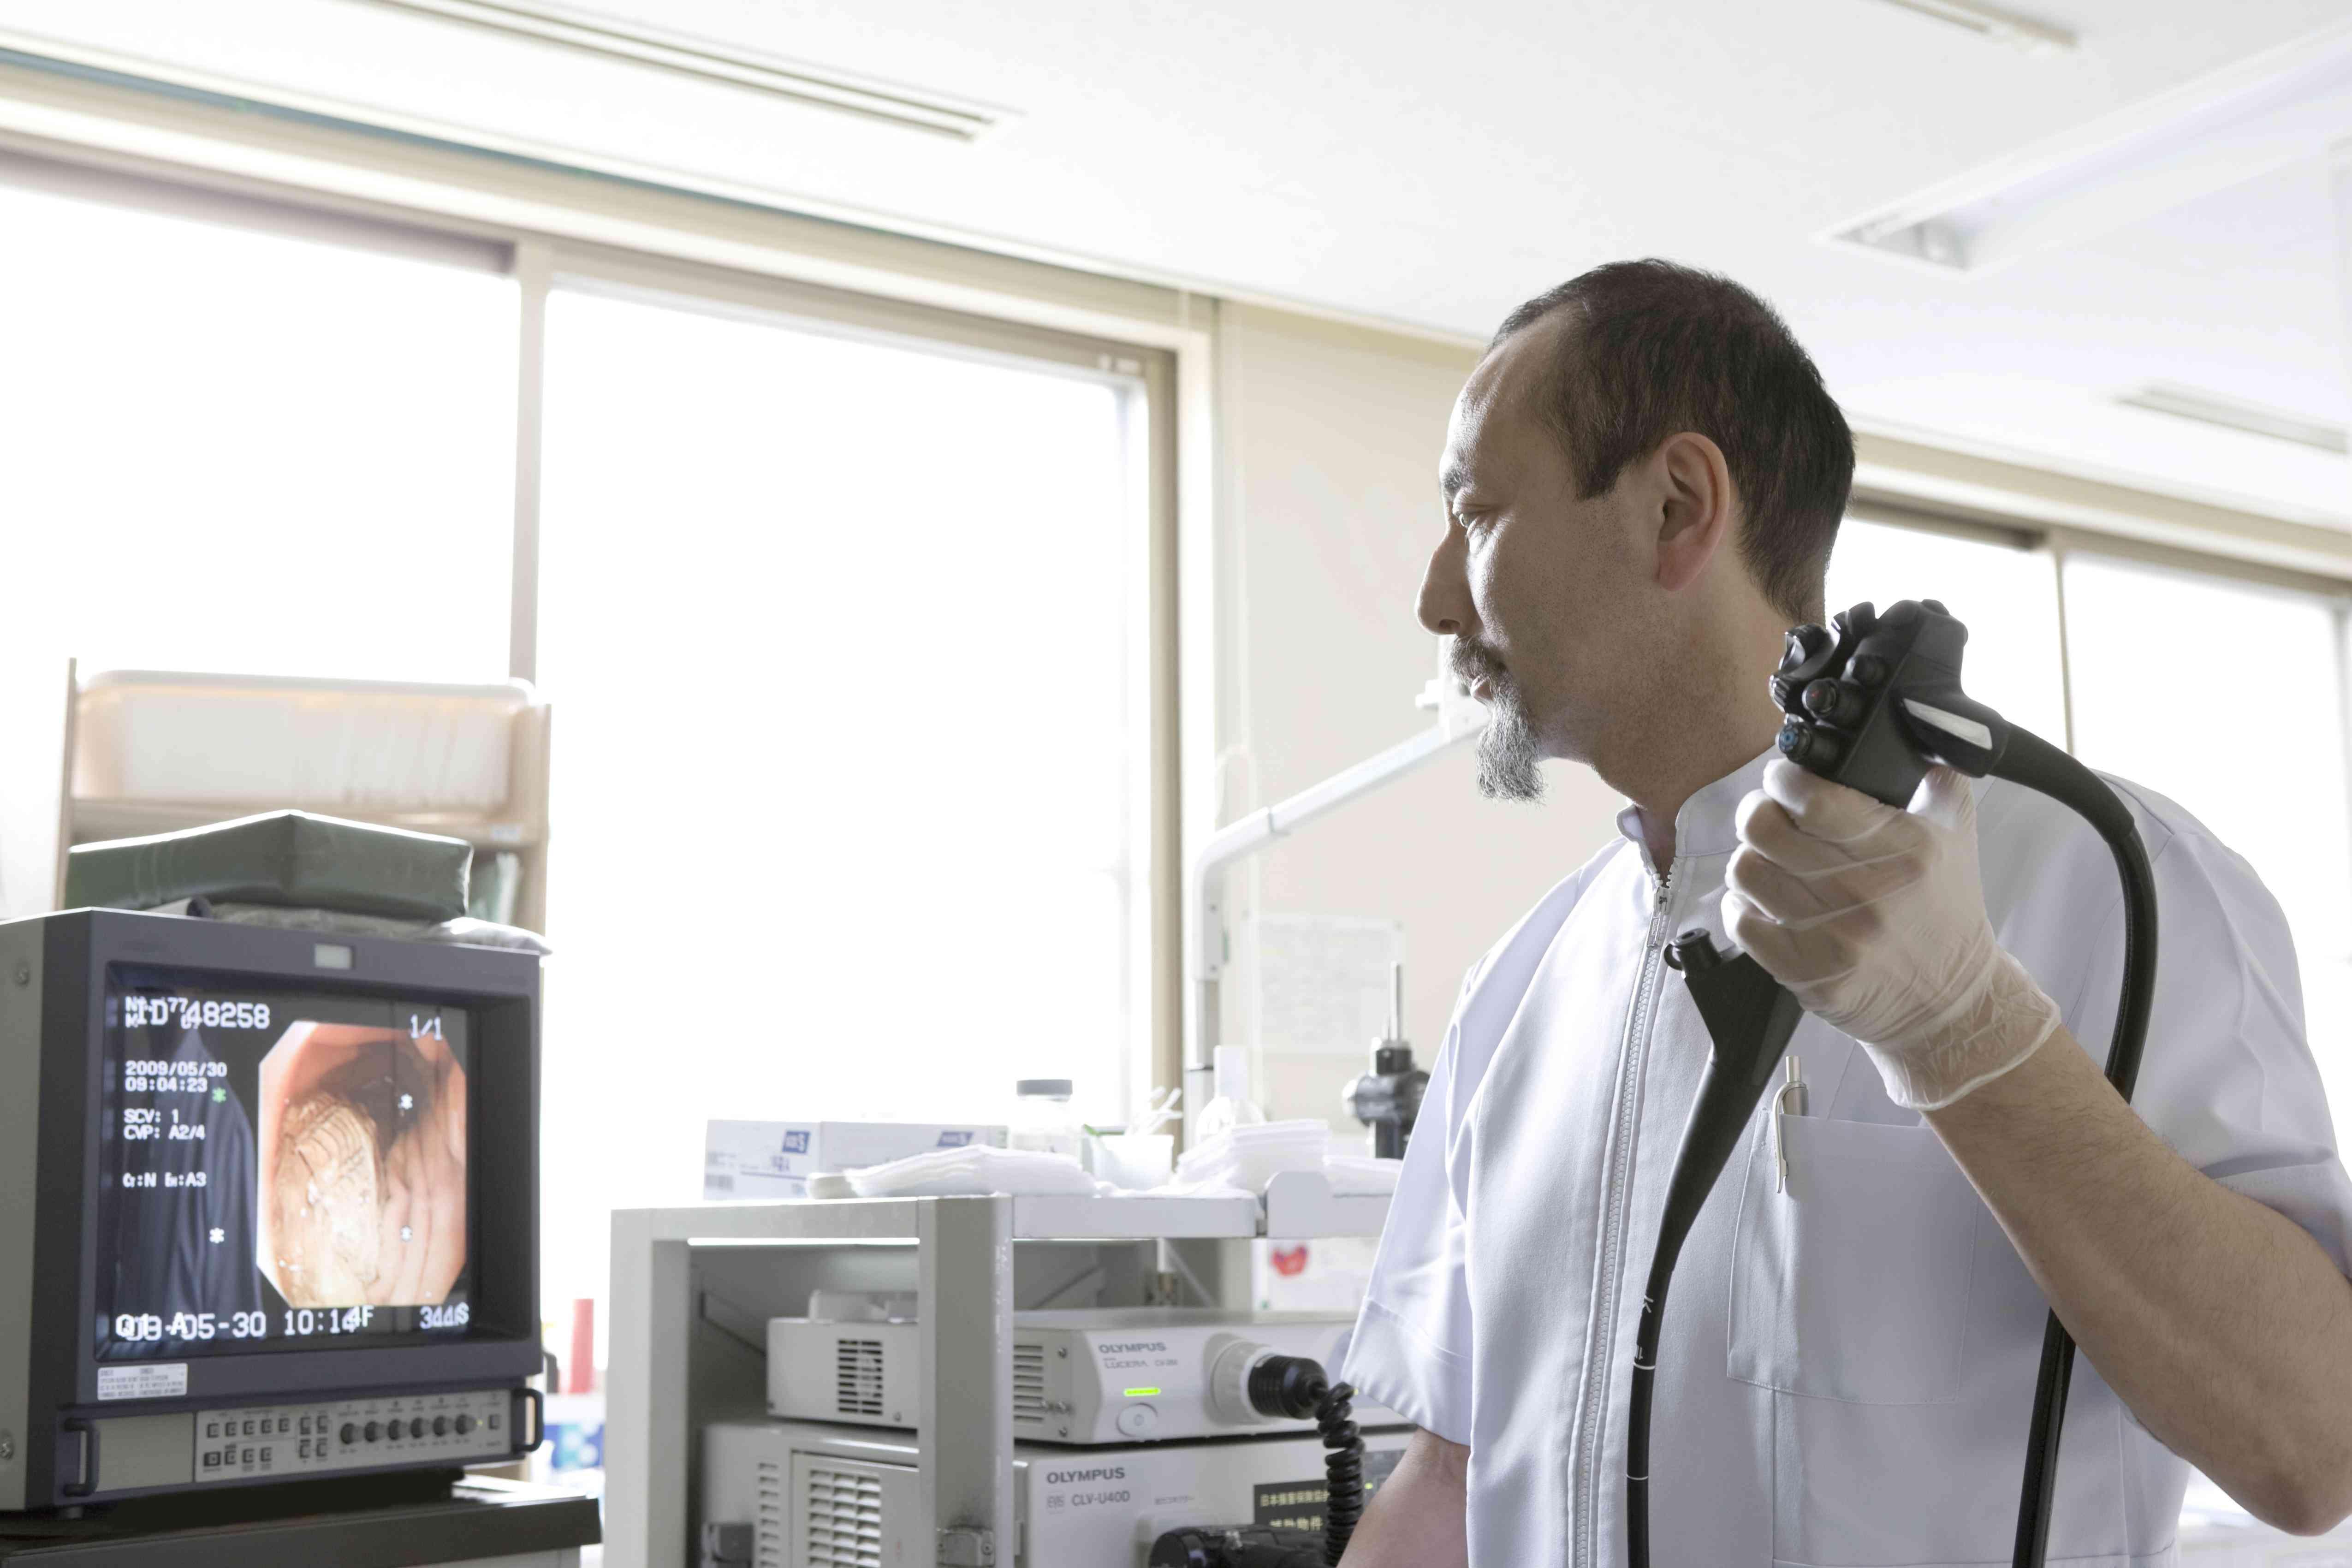 Doctor using endoscope